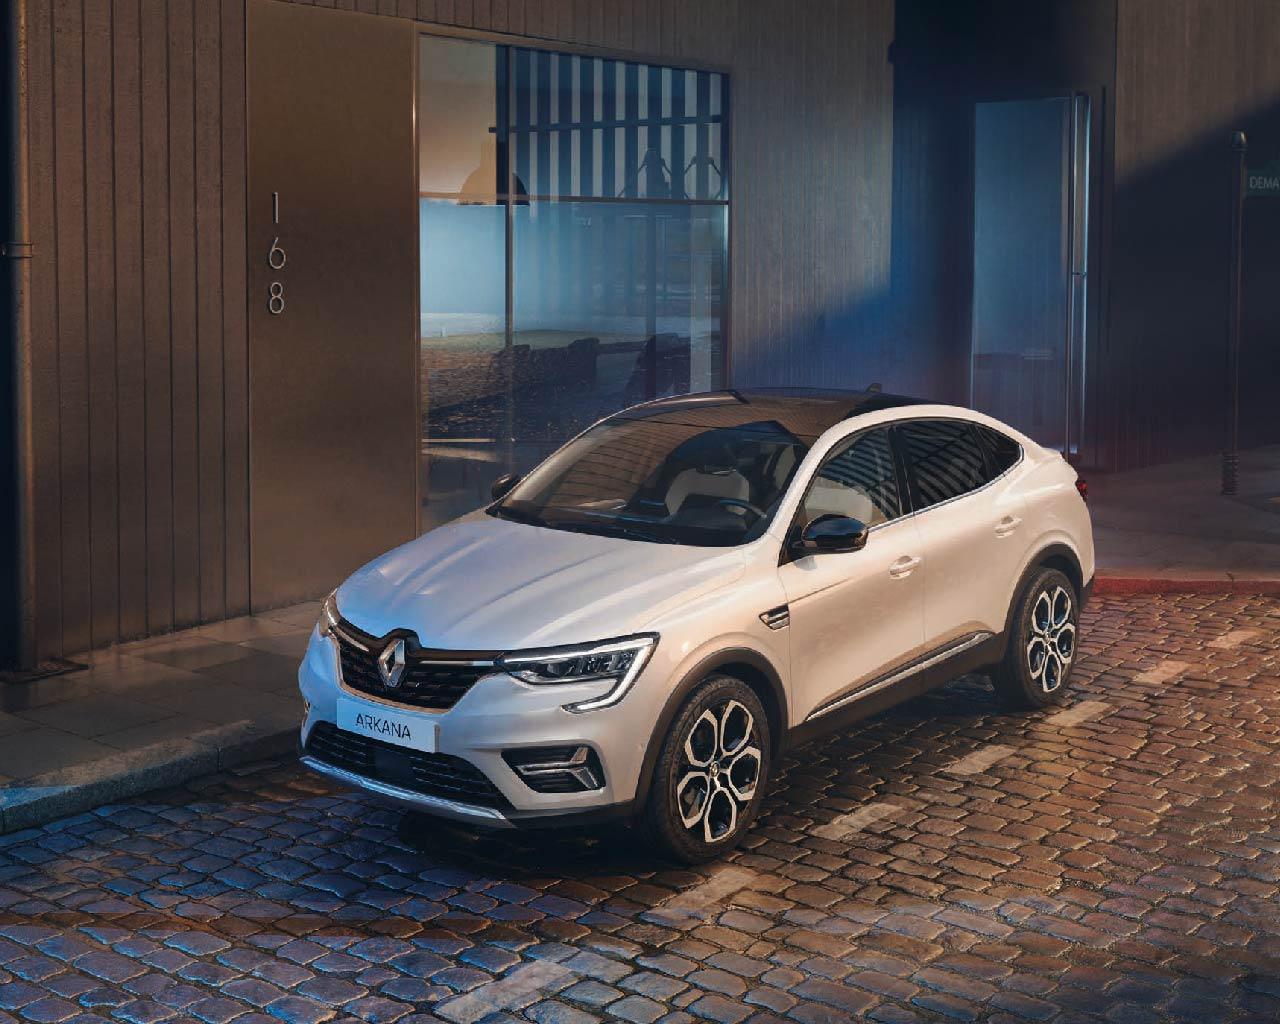 Vista frontale Nuova Renault Arkana SUV